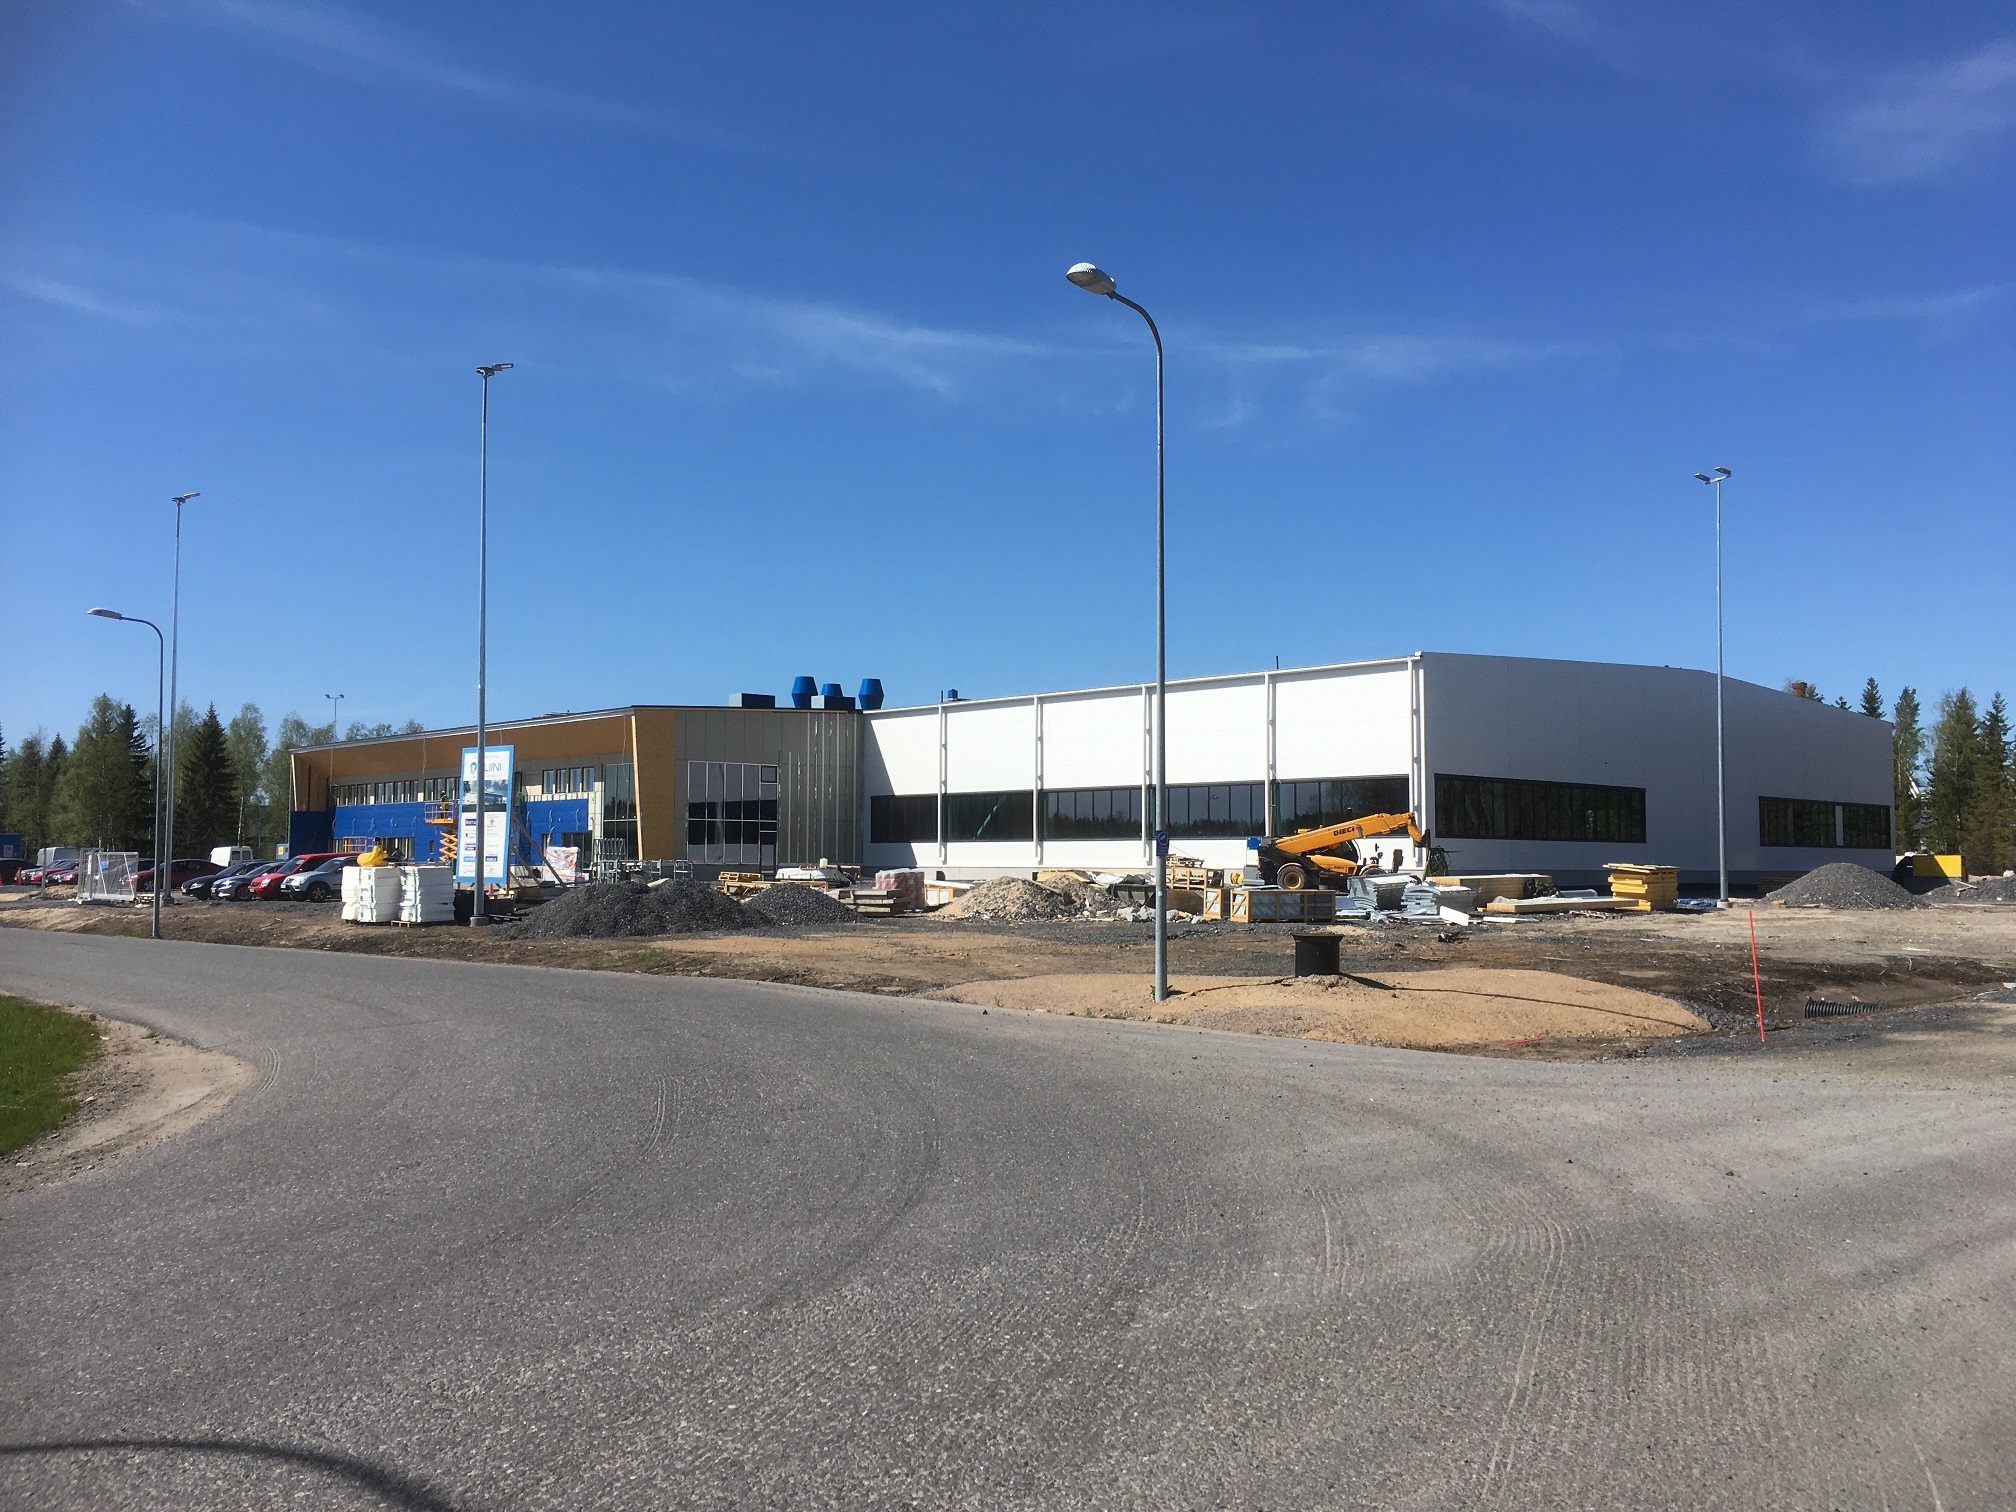 Oulun Keskuspesula